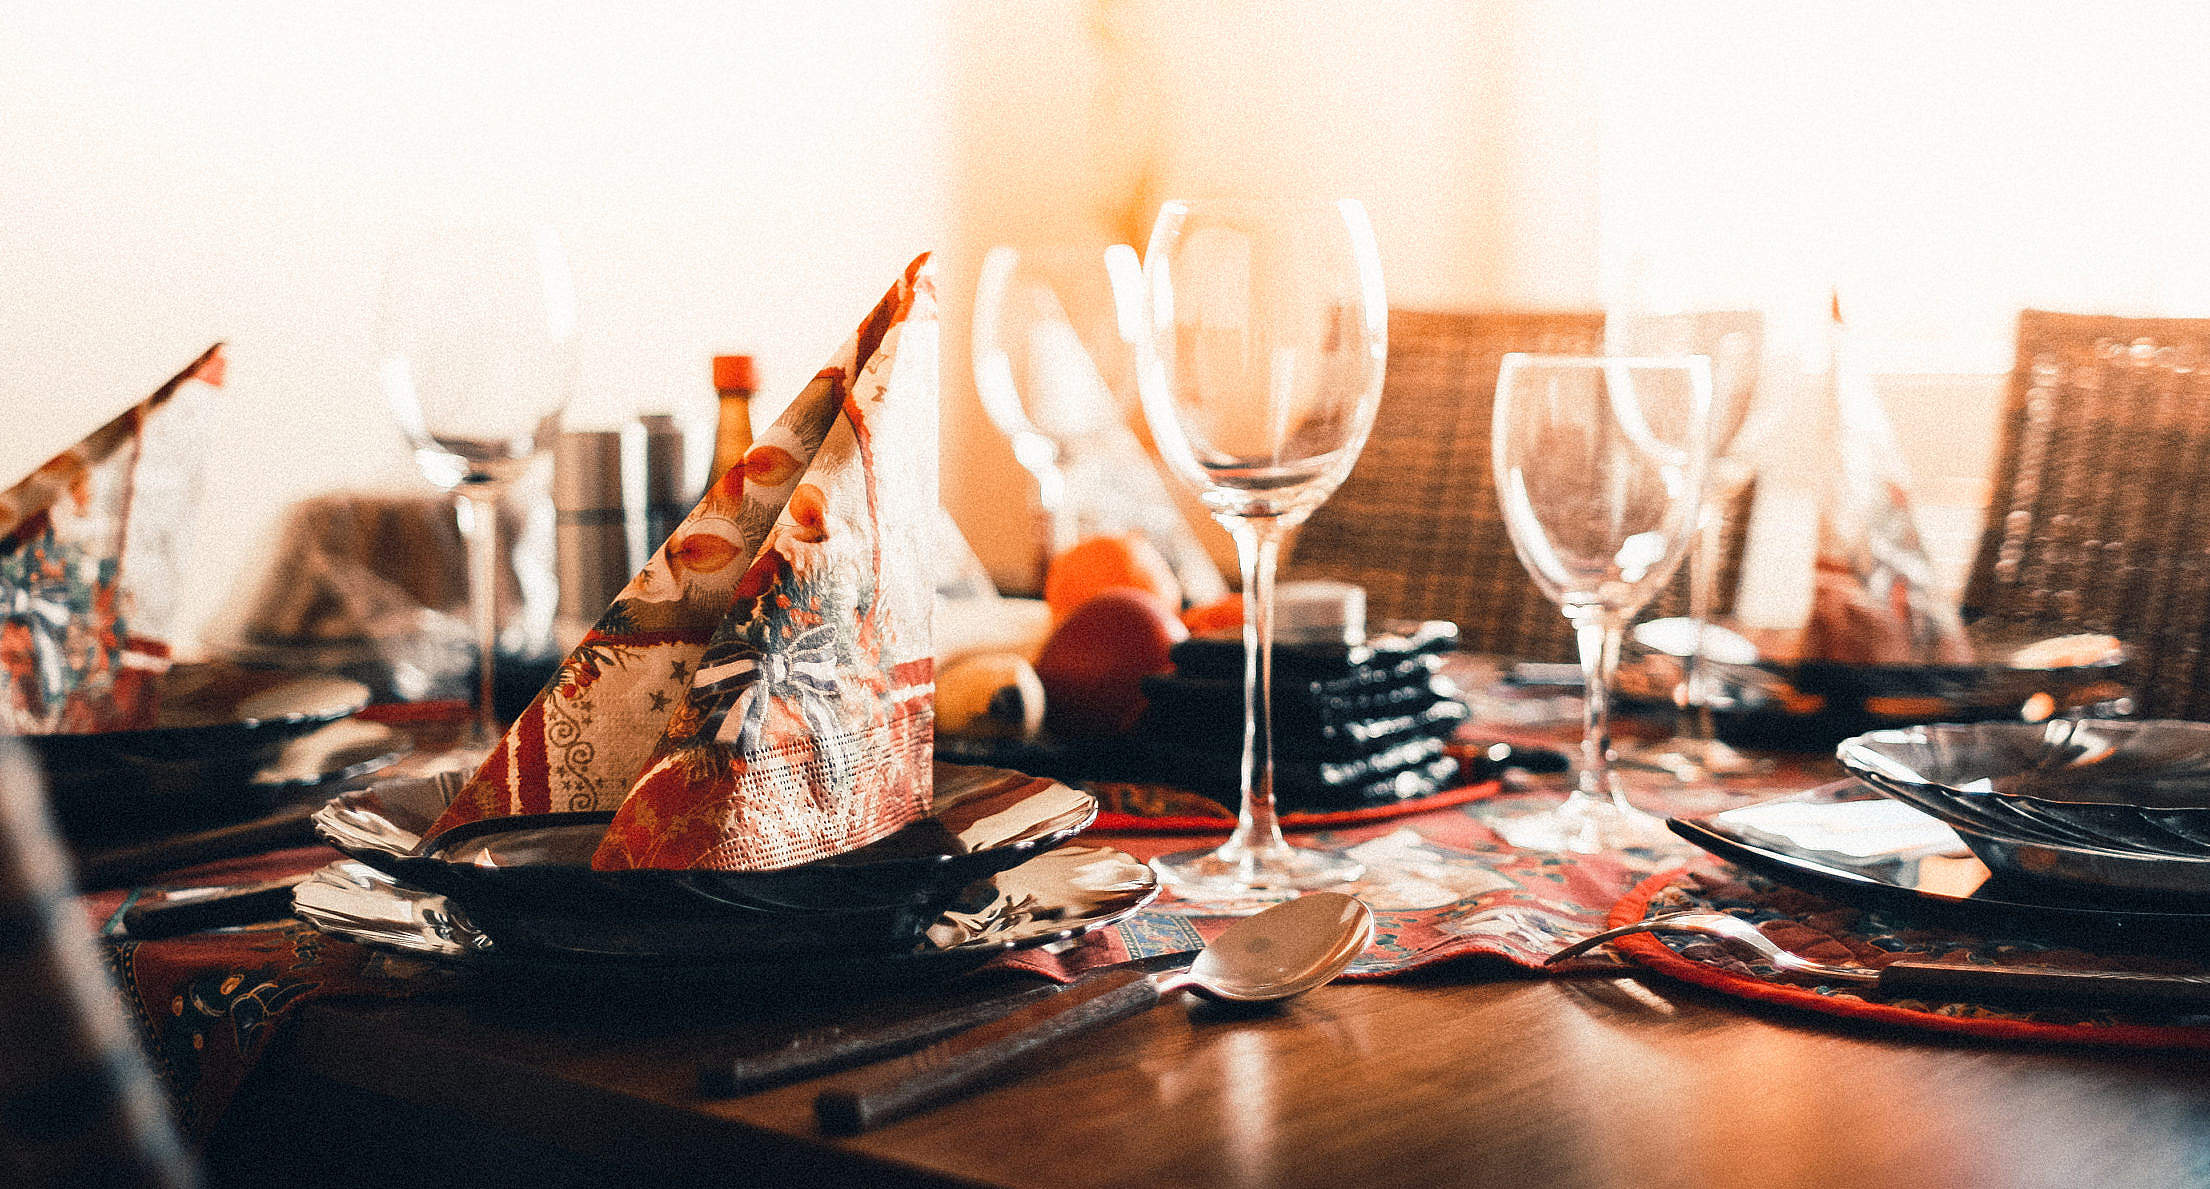 Christmas Dinner Table Setting Free Stock Photo